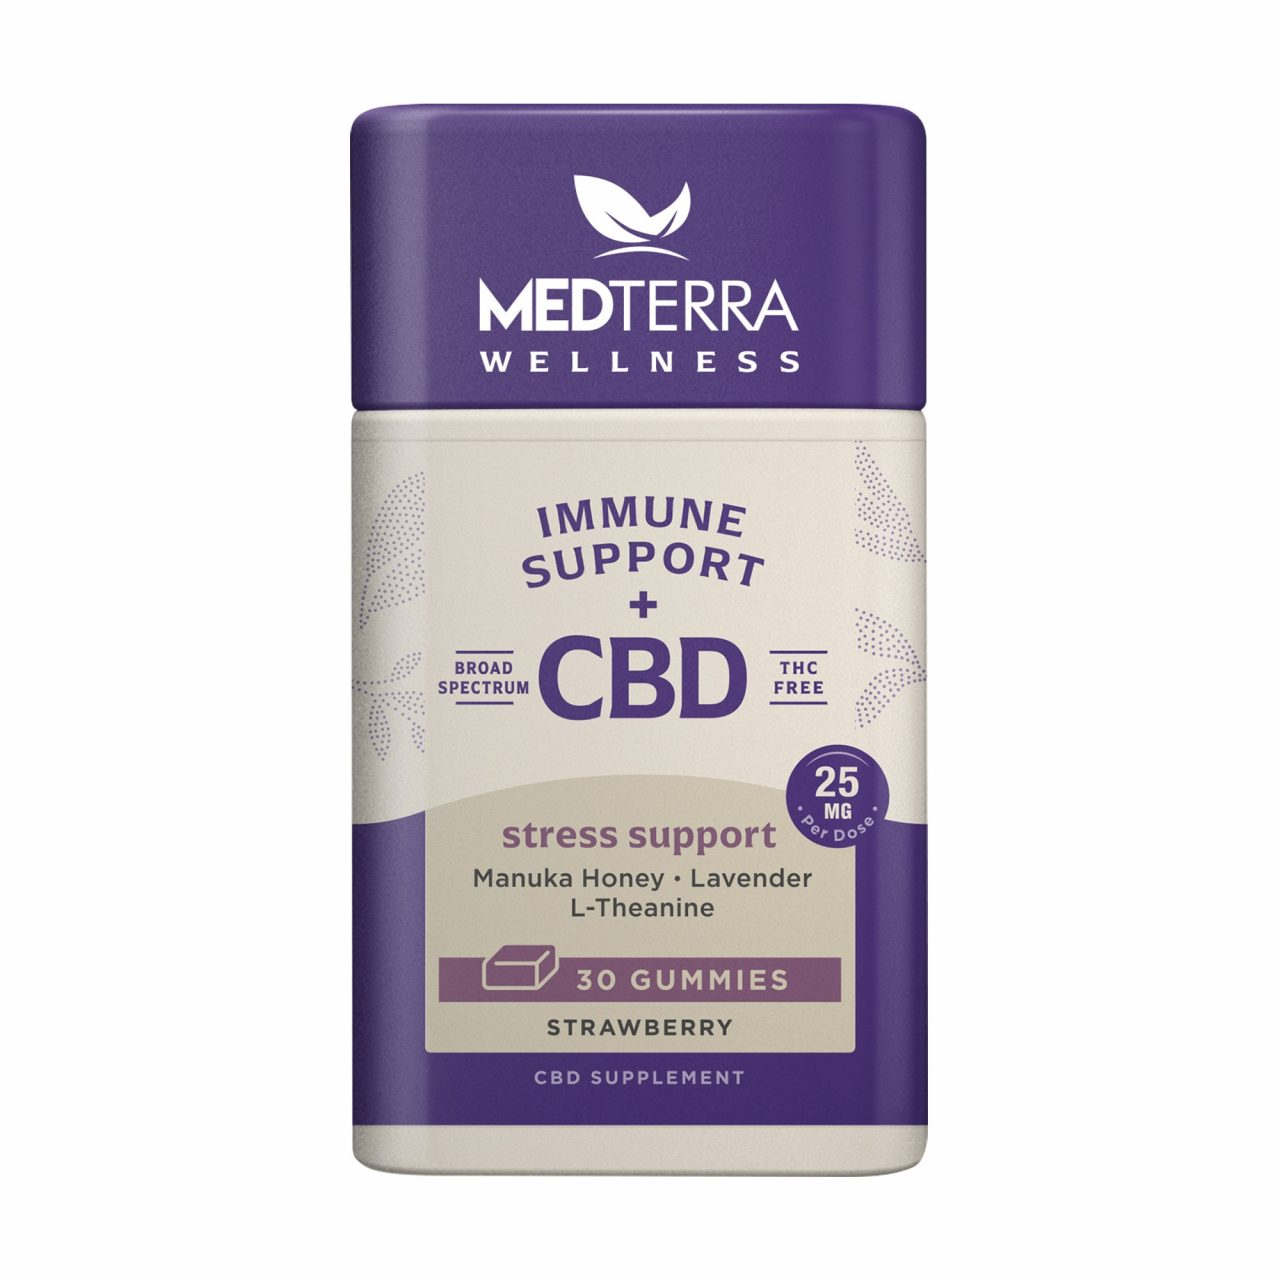 Medterra, Wellness CBD Gummies, Stress Support, Broad Spectrum THC-Free, Strawberry, 30ct, 750mg CBD 1